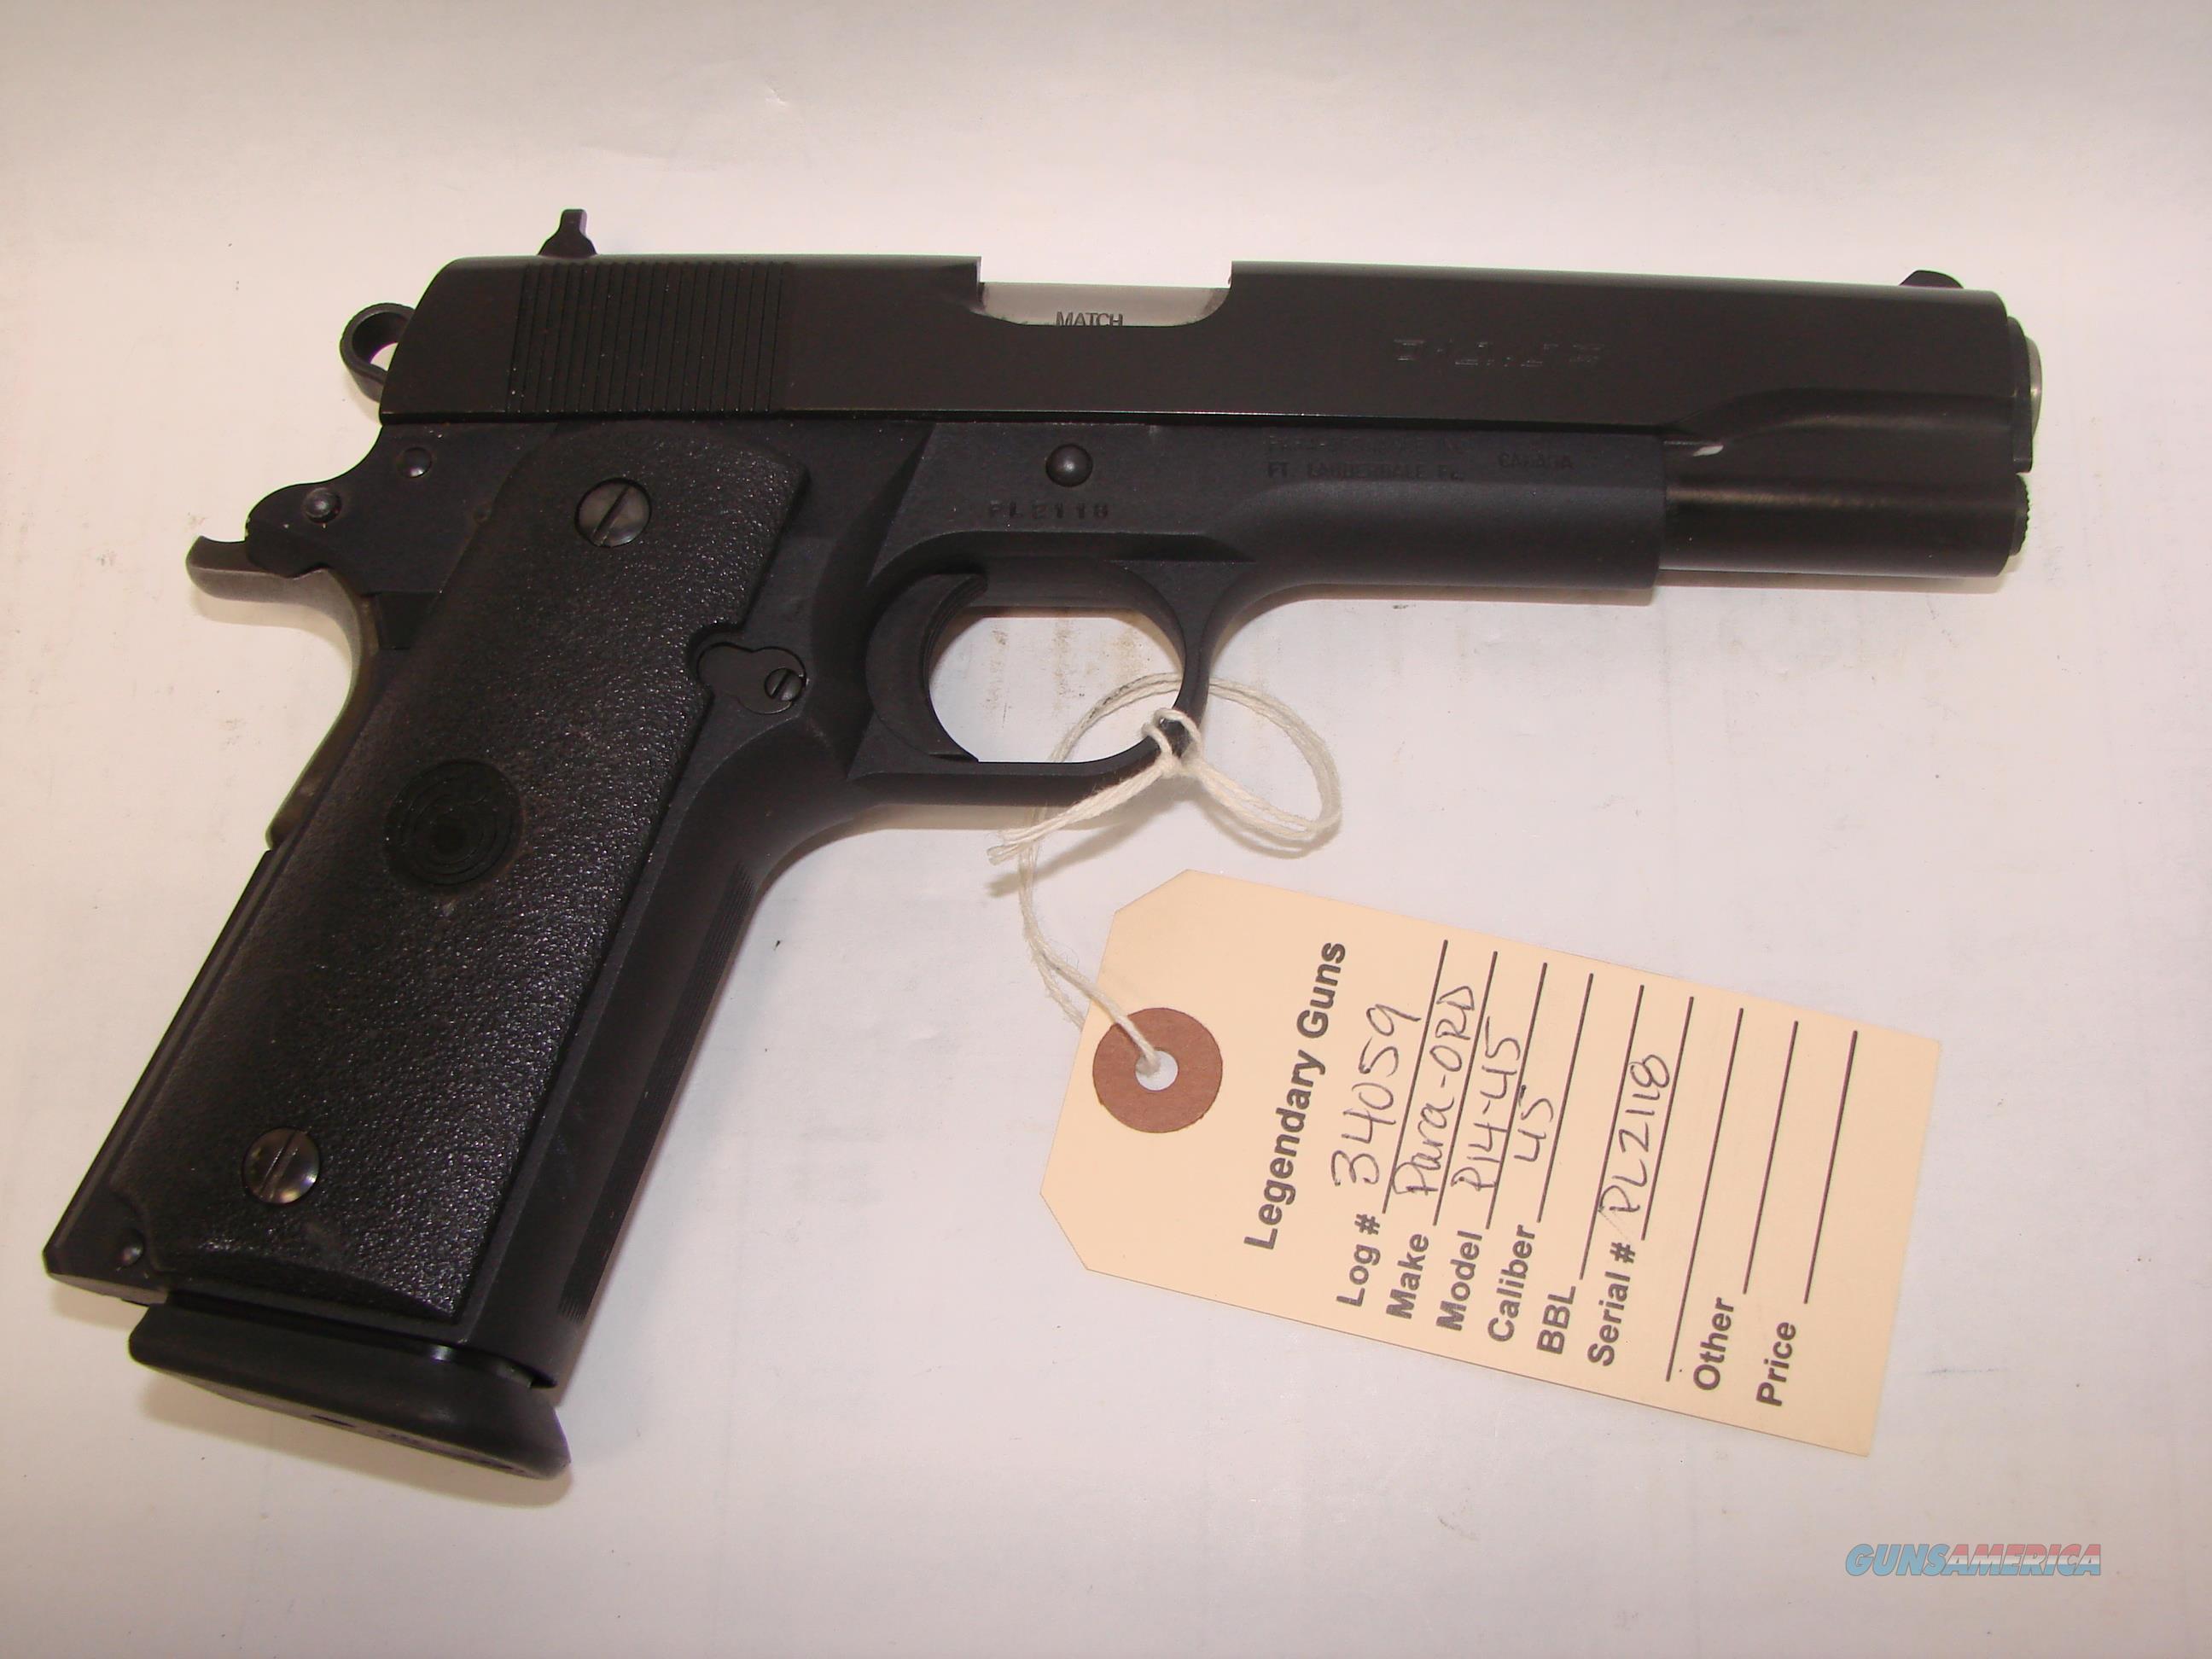 Para Ordnance P14-45  Guns > Pistols > Para Ordnance Pistols